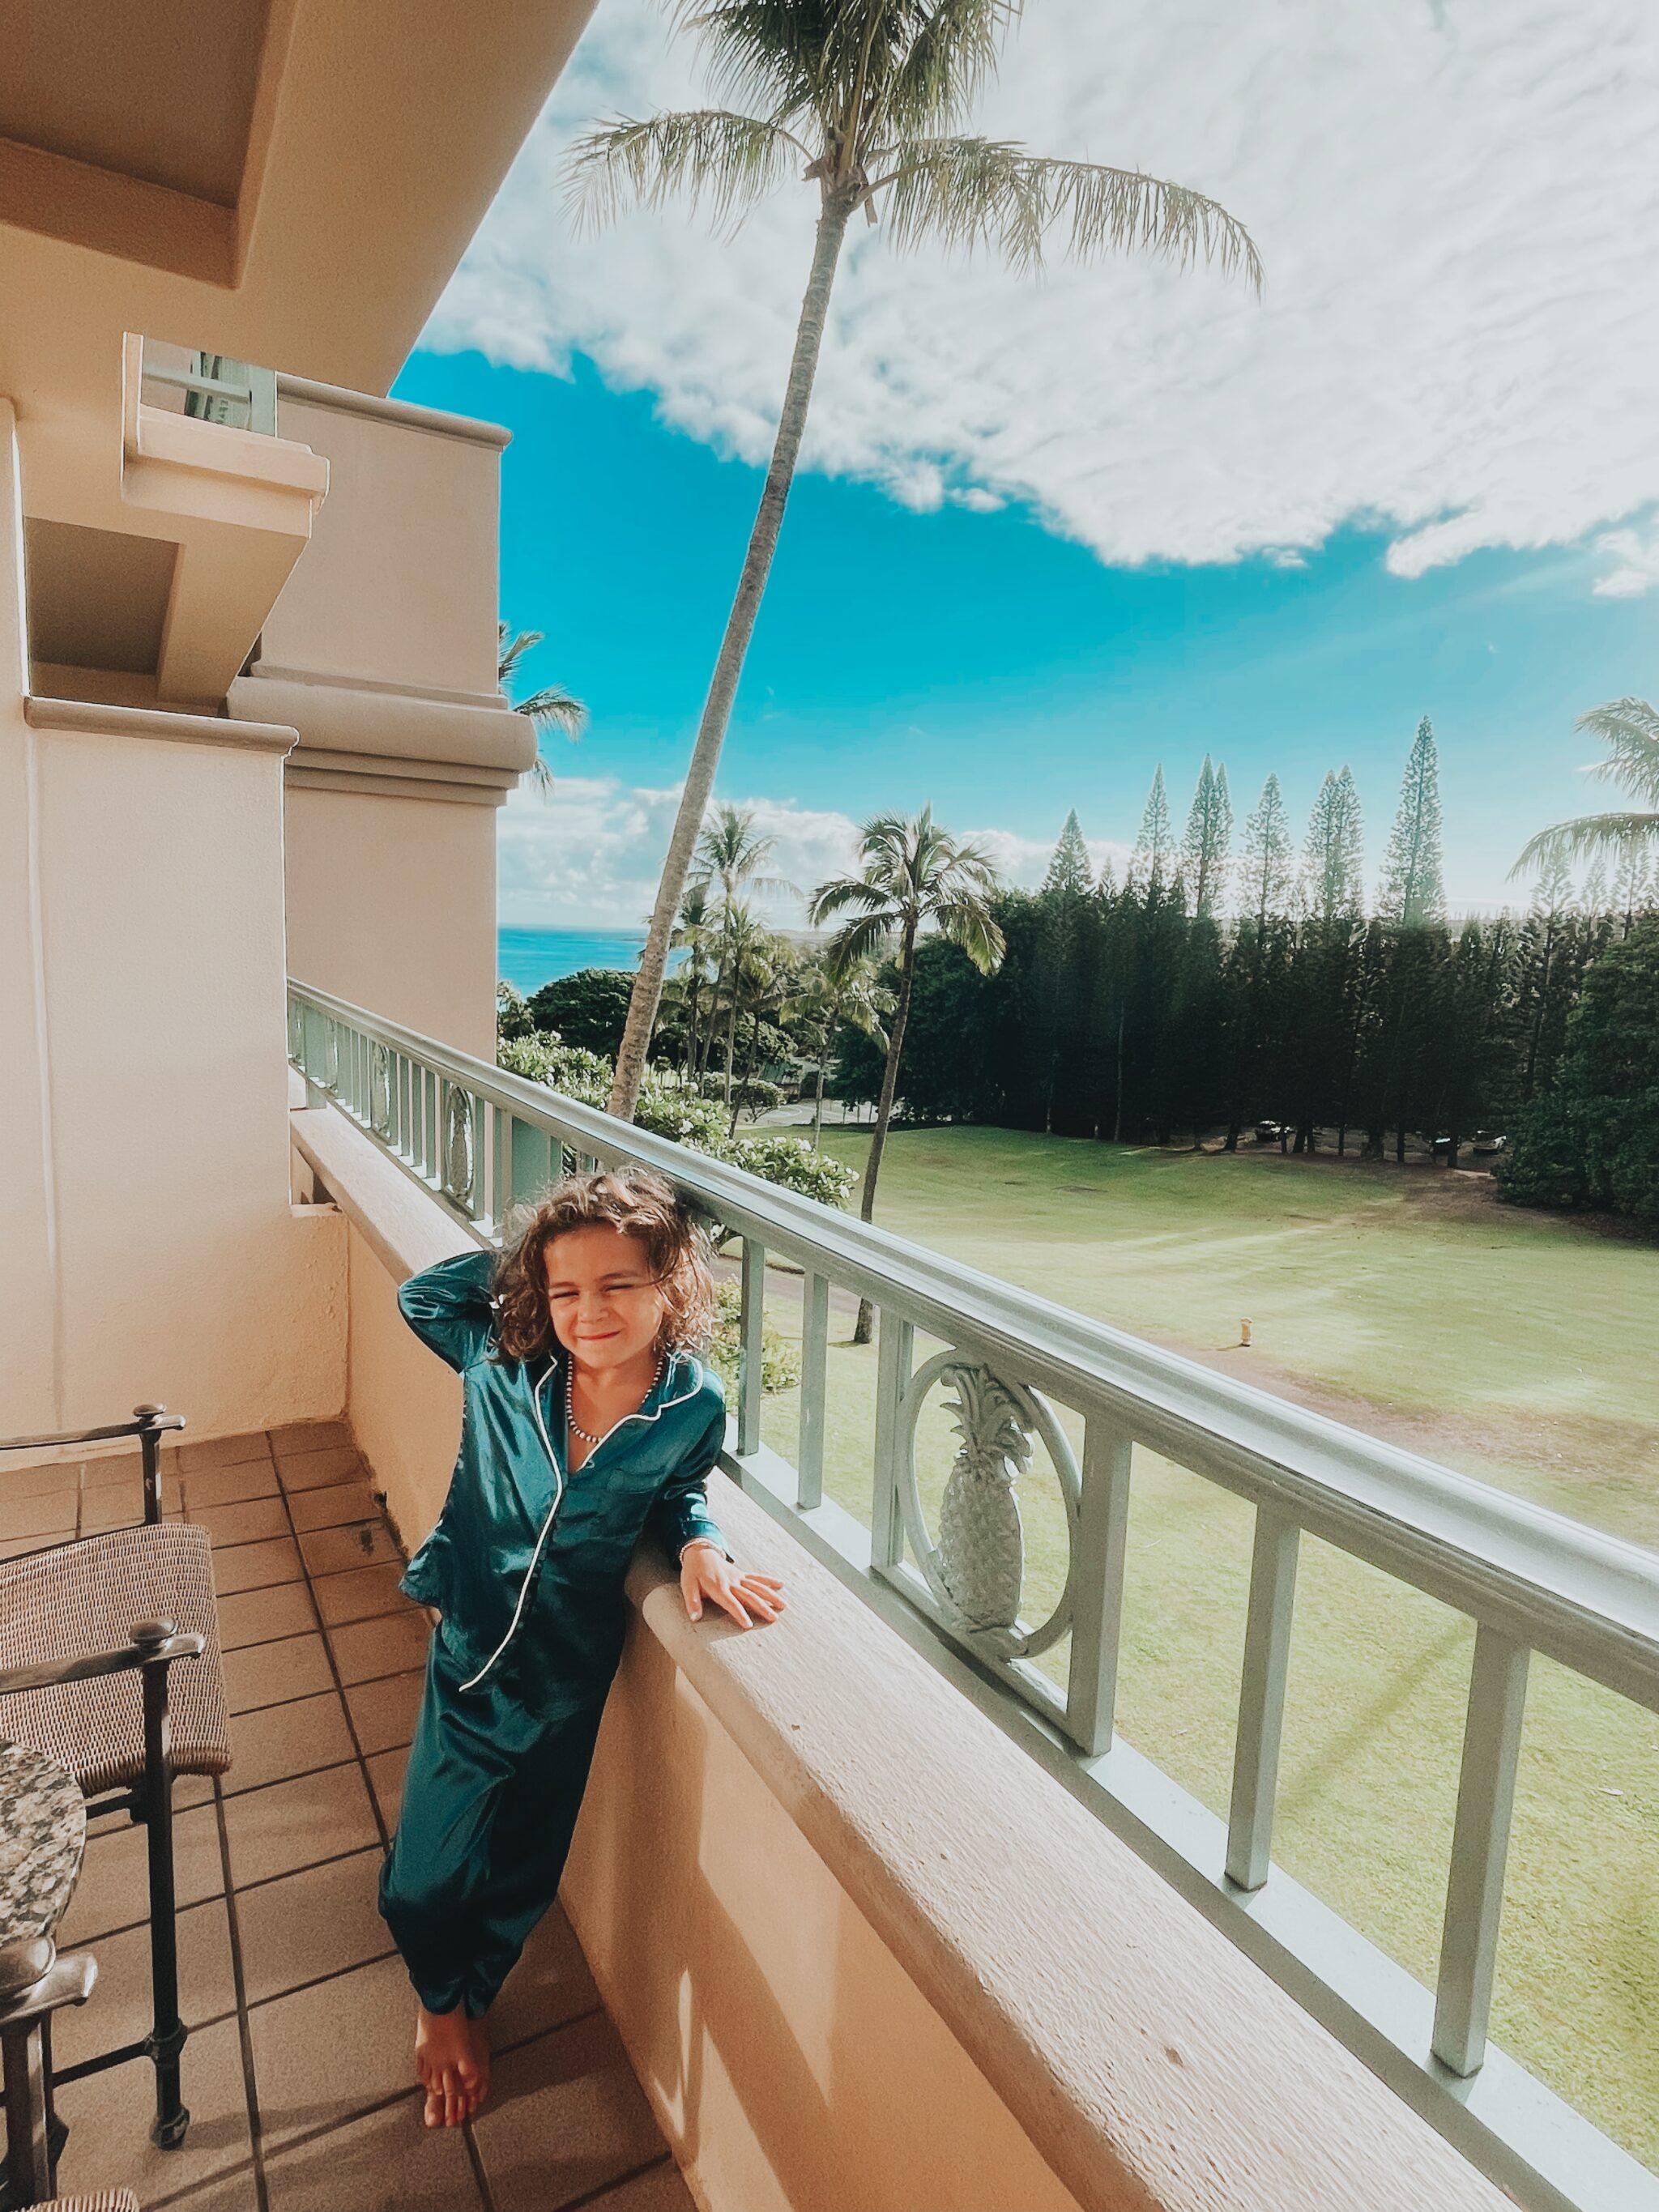 boy on balcony